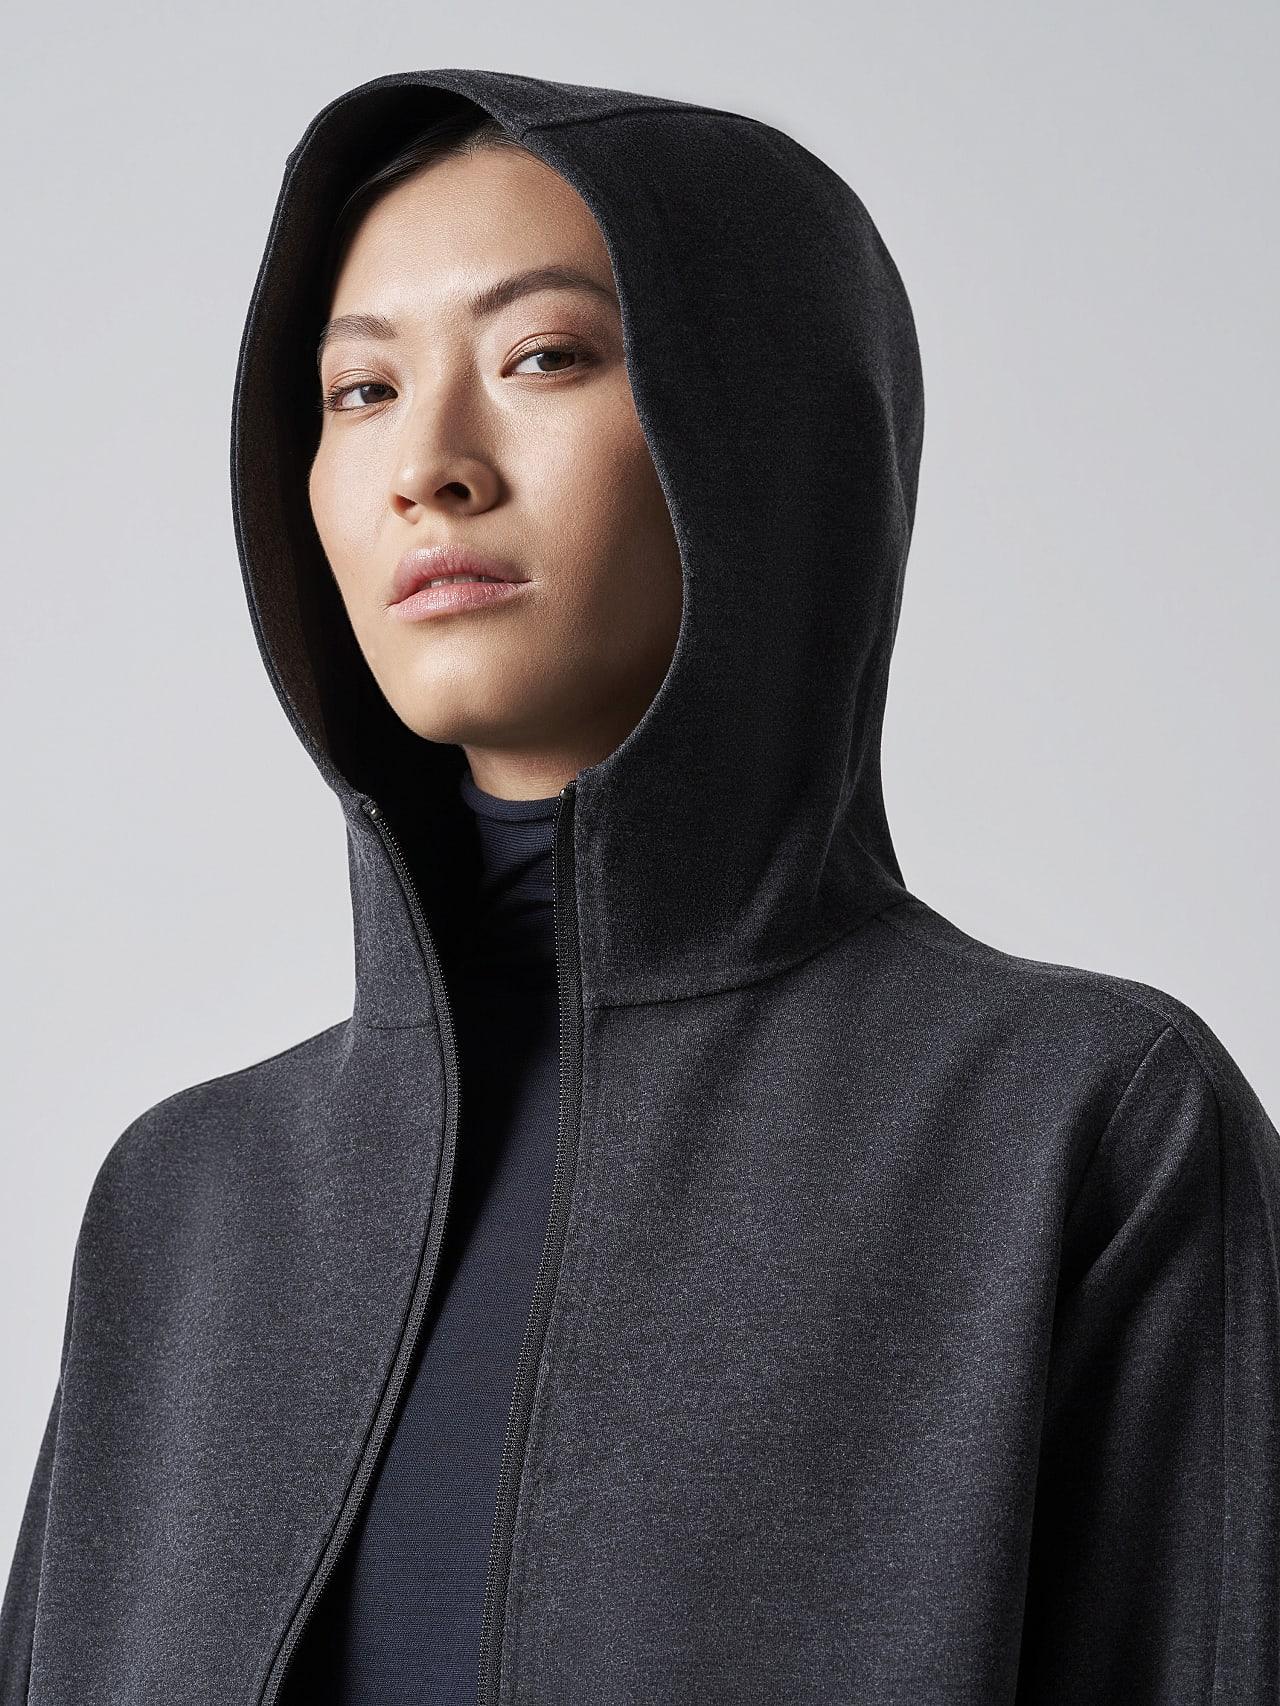 SINNO V2.Y5.02 Waterproof Hooded Jacket dark grey / anthracite Extra Alpha Tauri